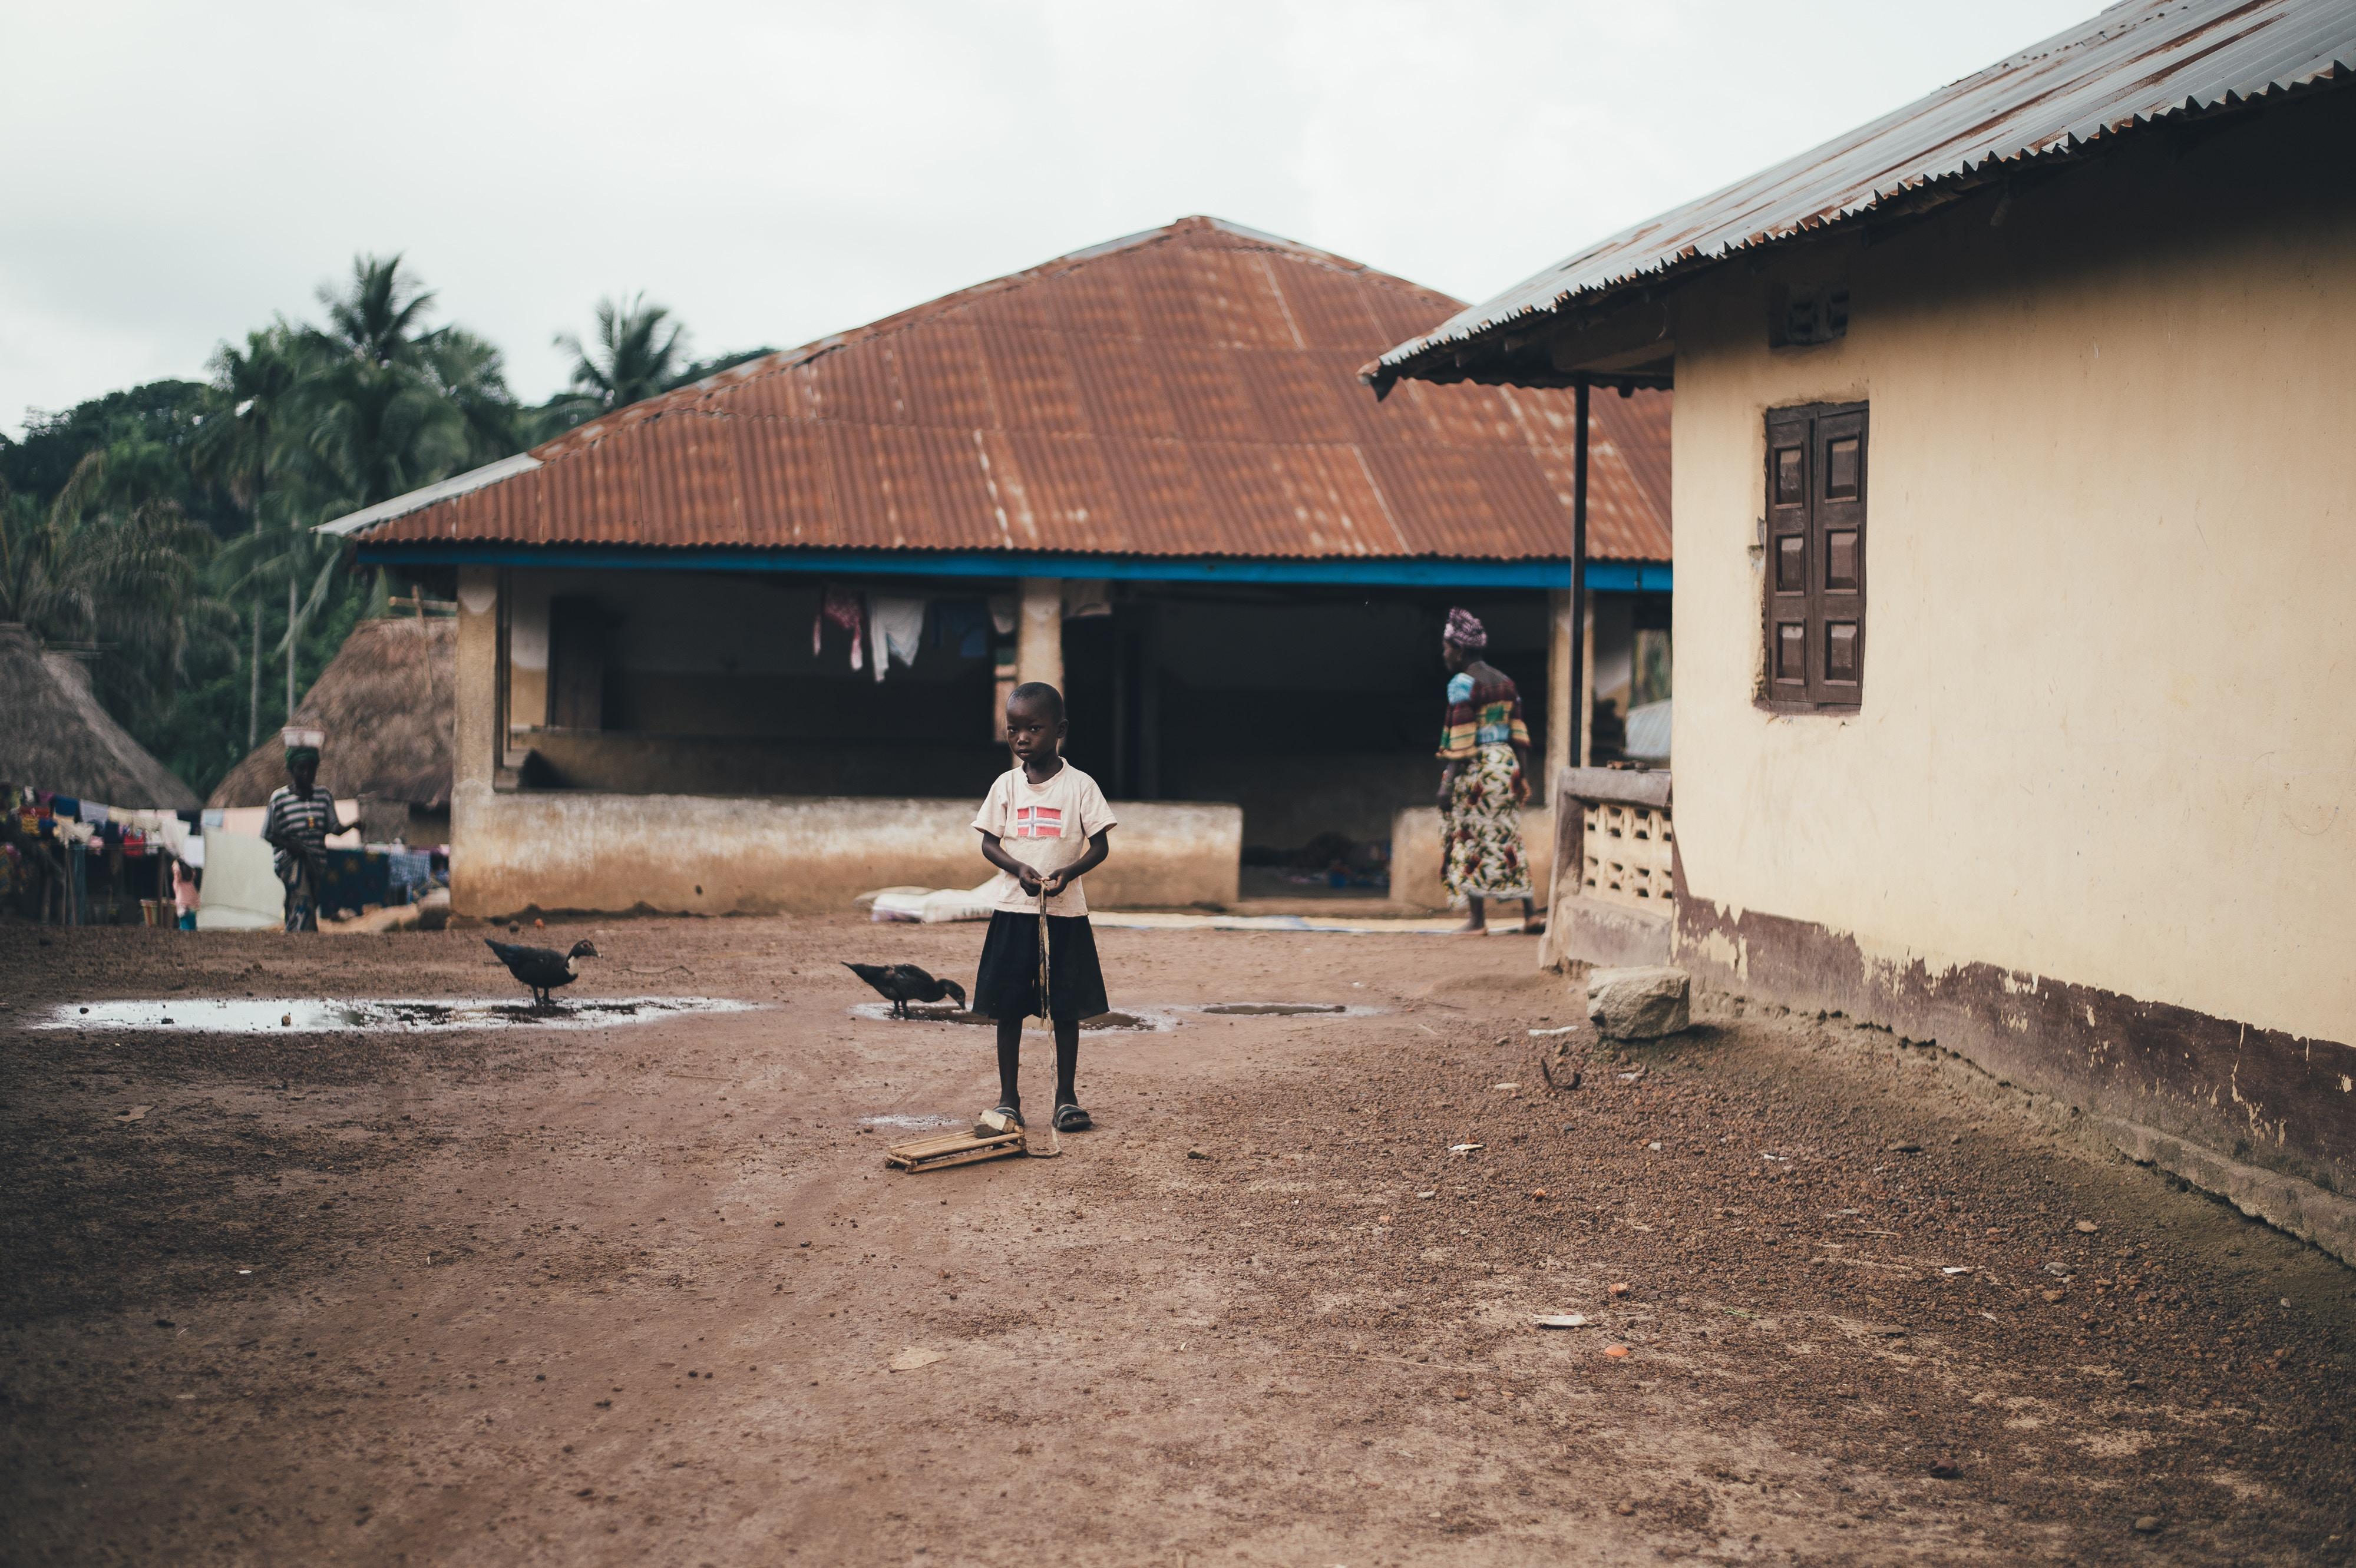 Ministry seeking to break prison cycle for Sierra Leone street orphans